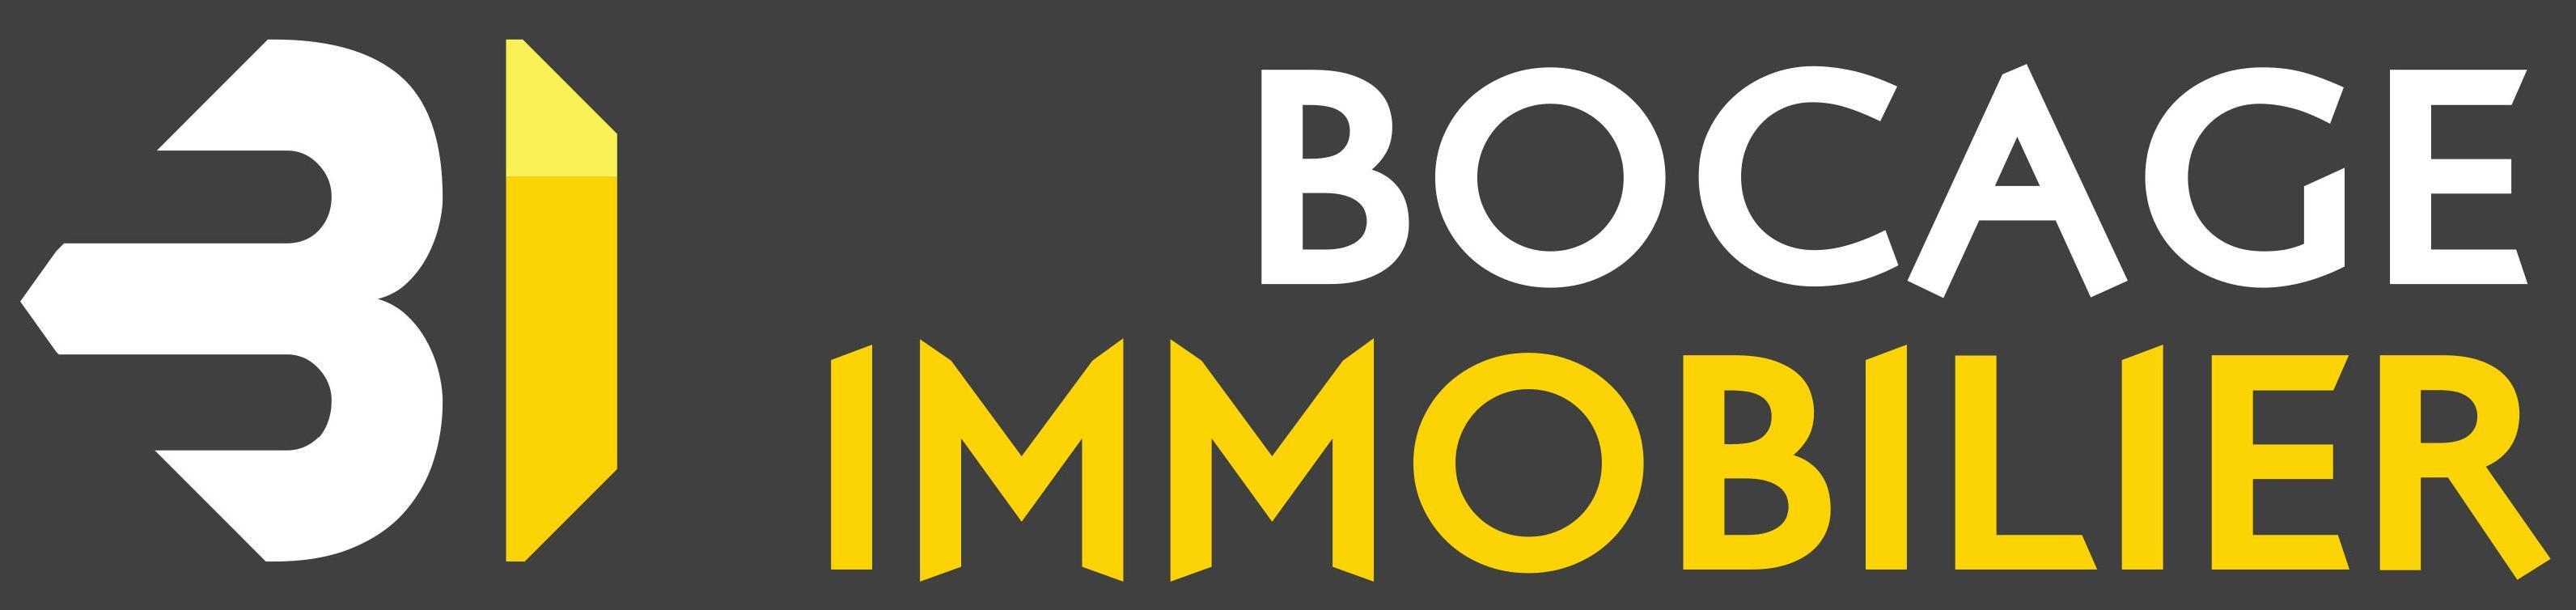 Bocage Immobilier agence immobilière Niort (79000)